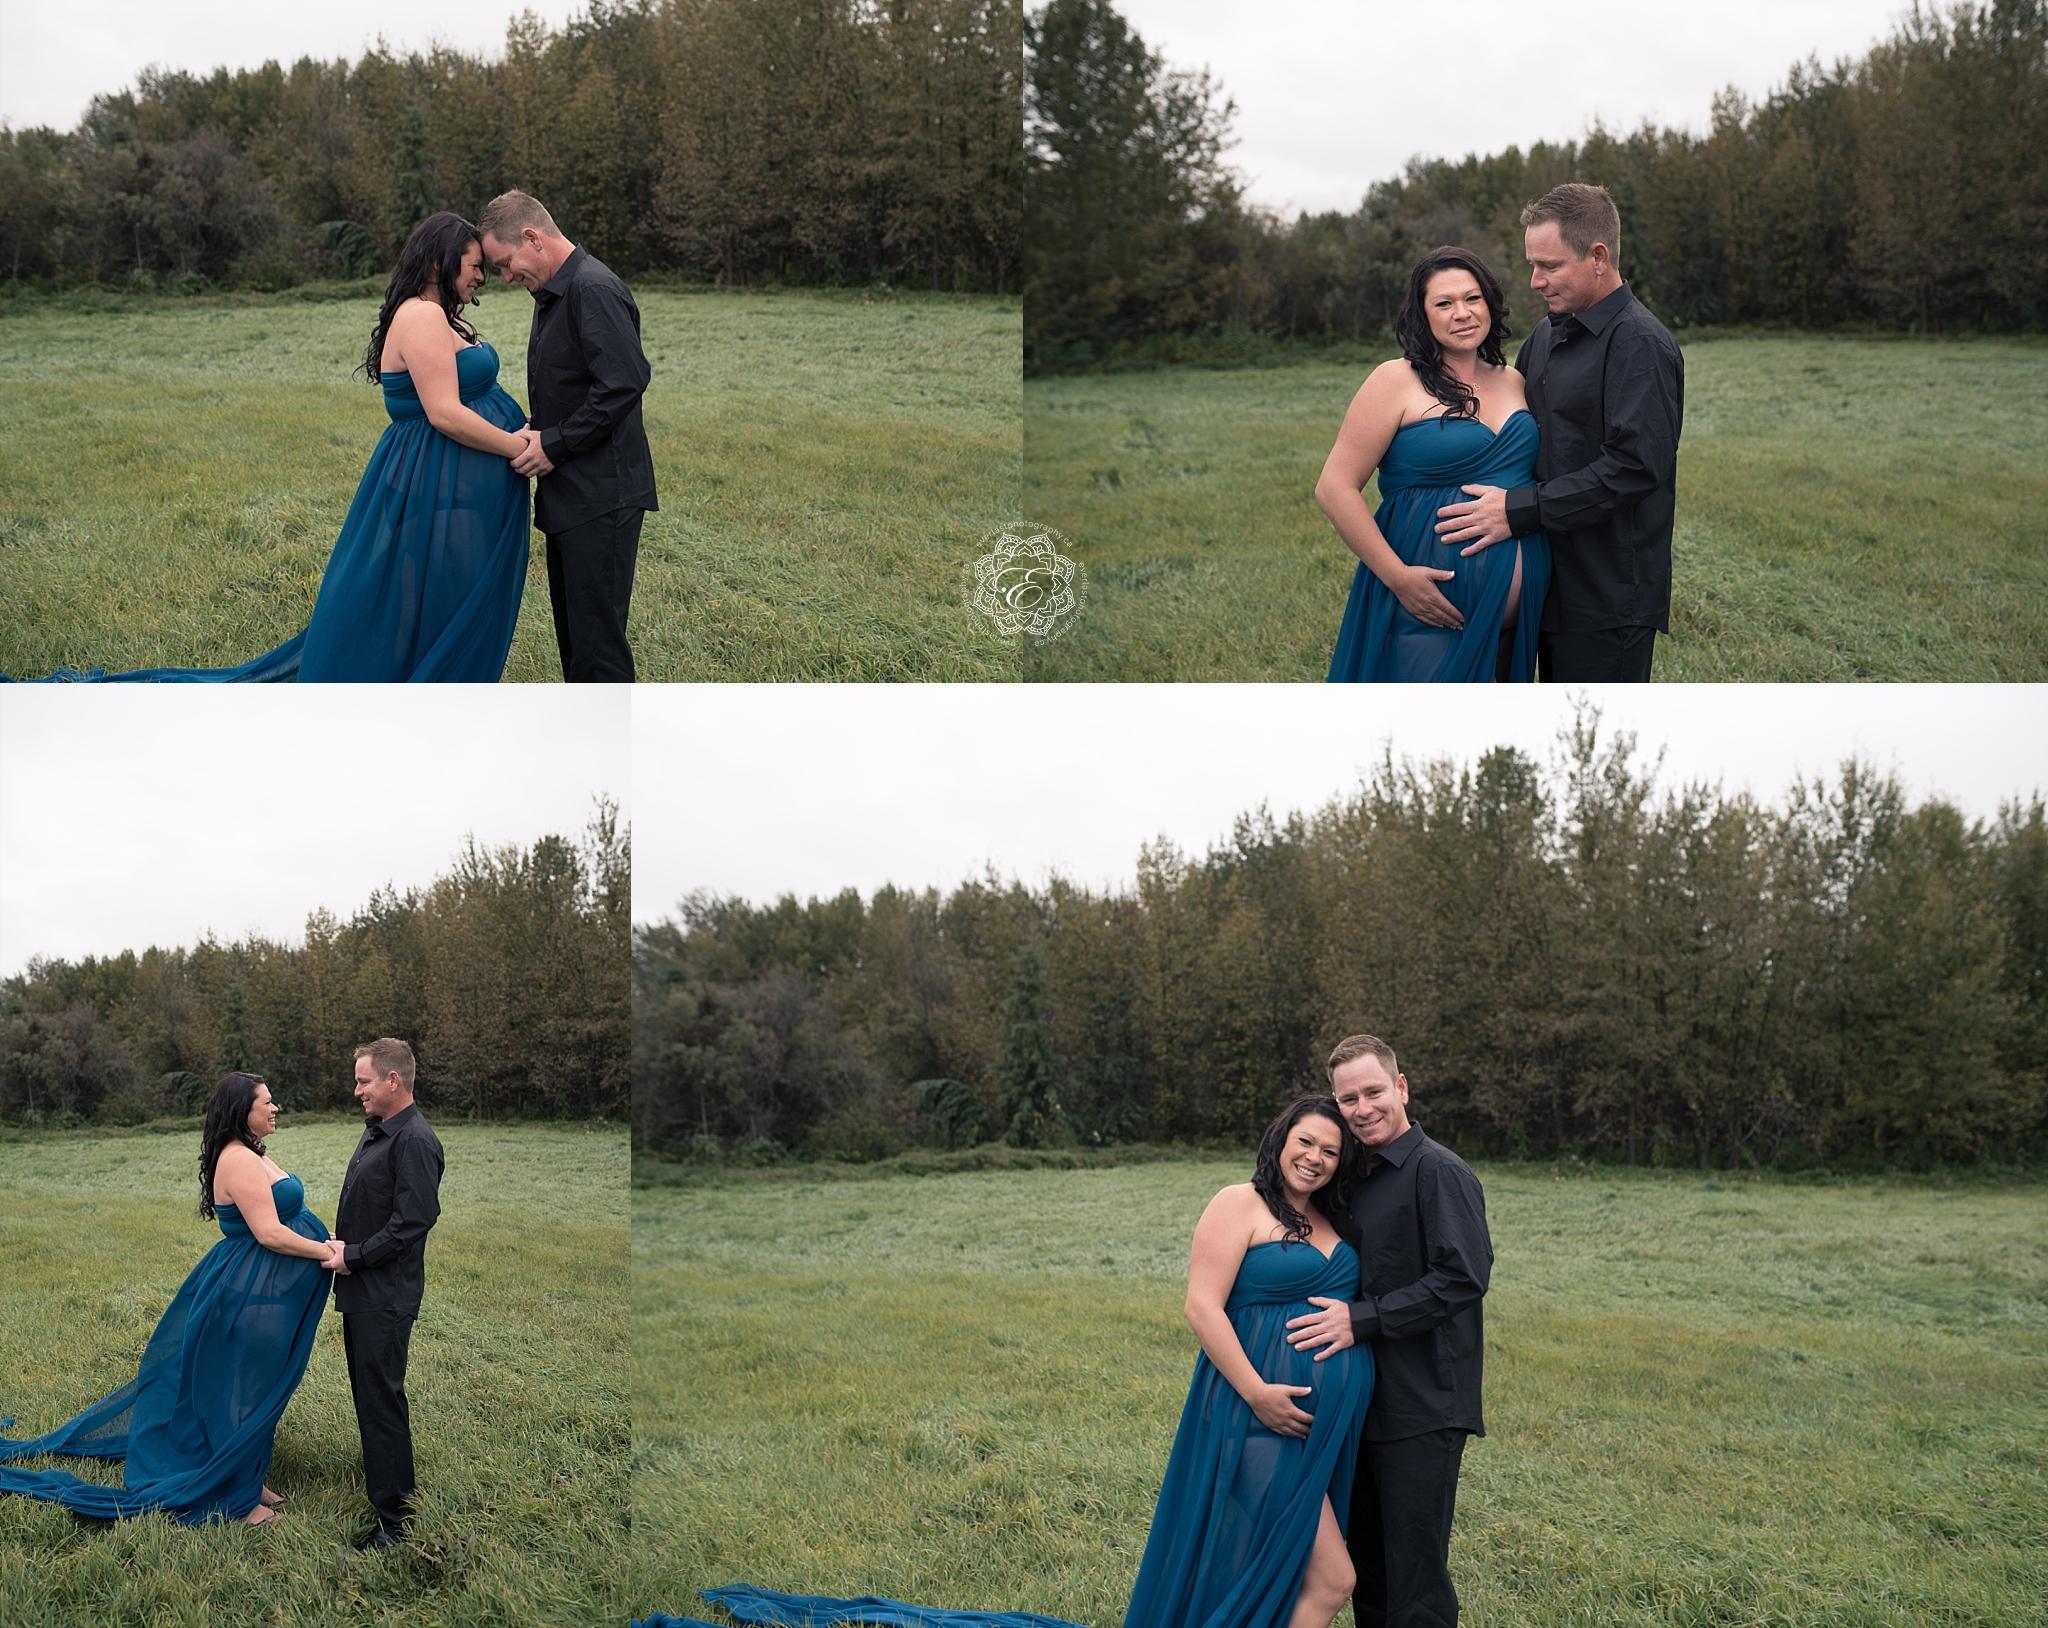 couples-maternity-photos-edmonton.jpg